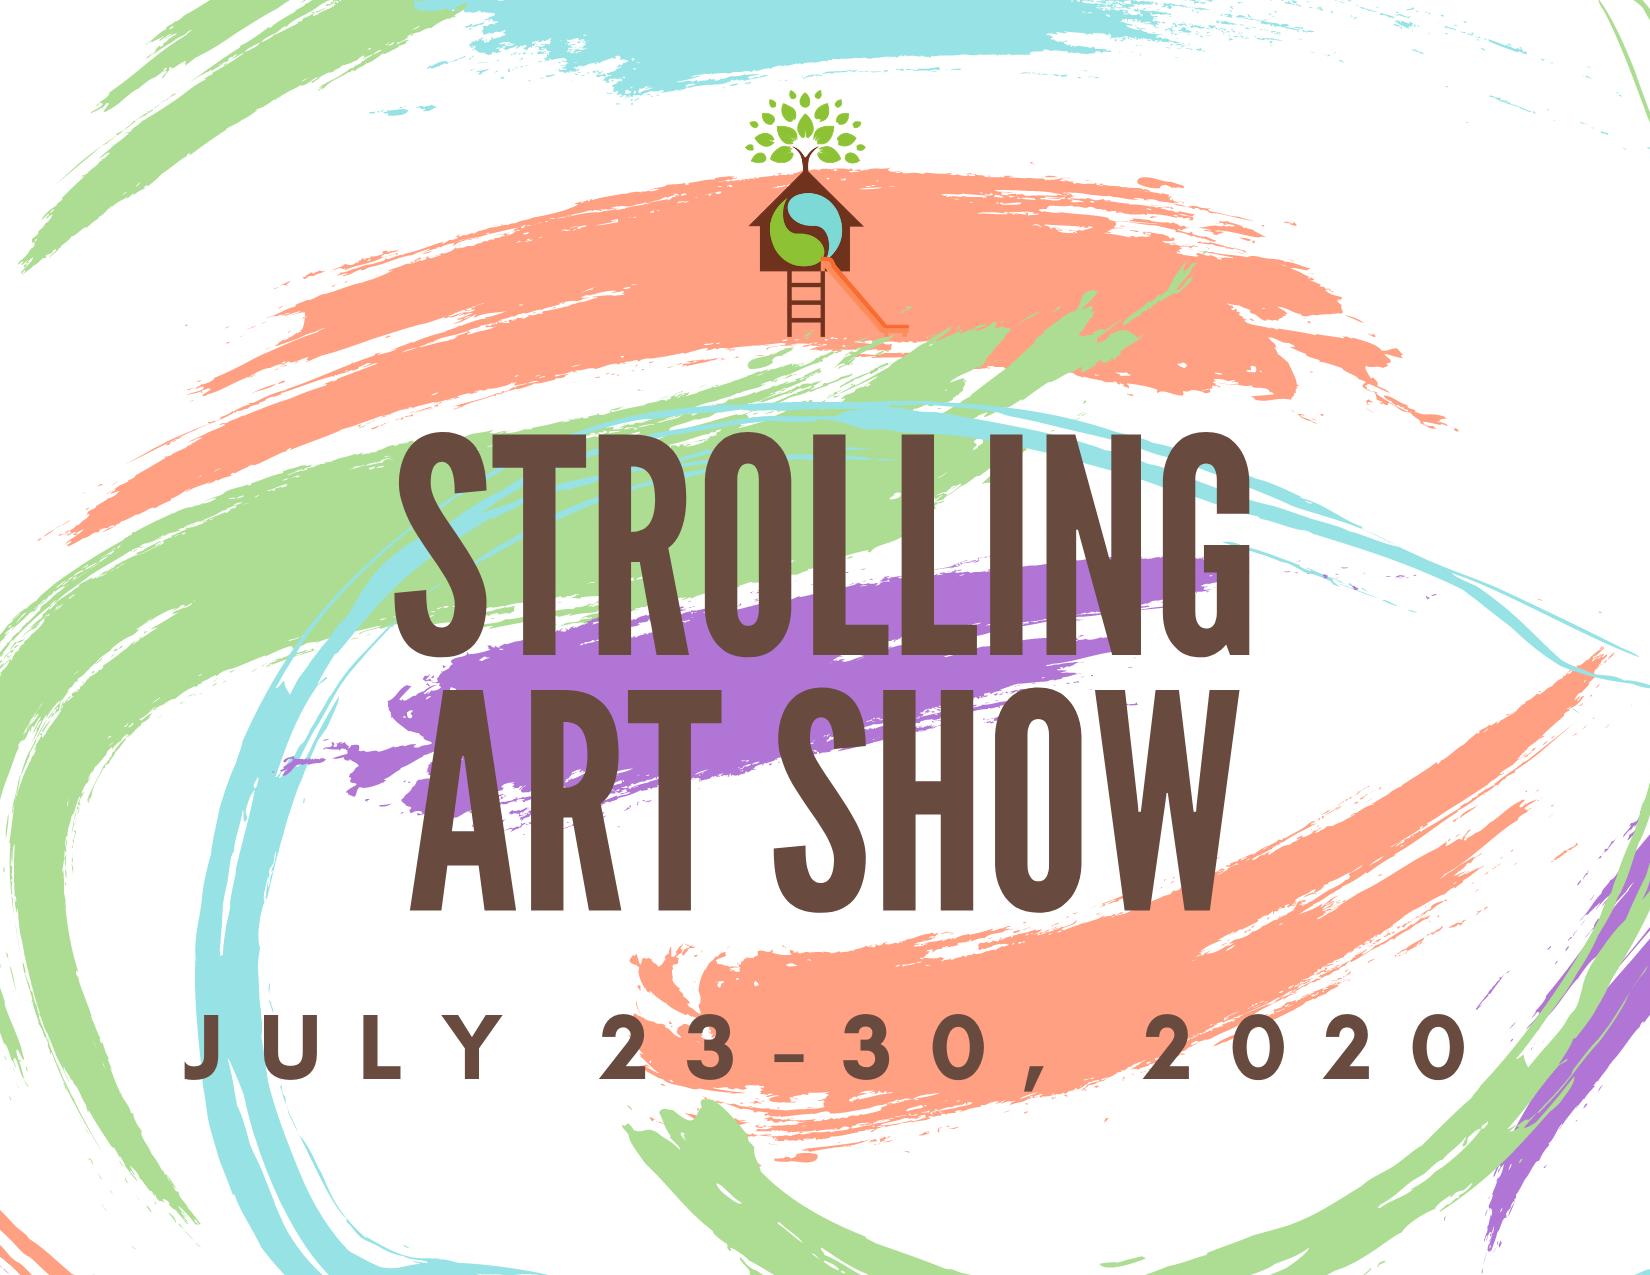 Strolling Art Show